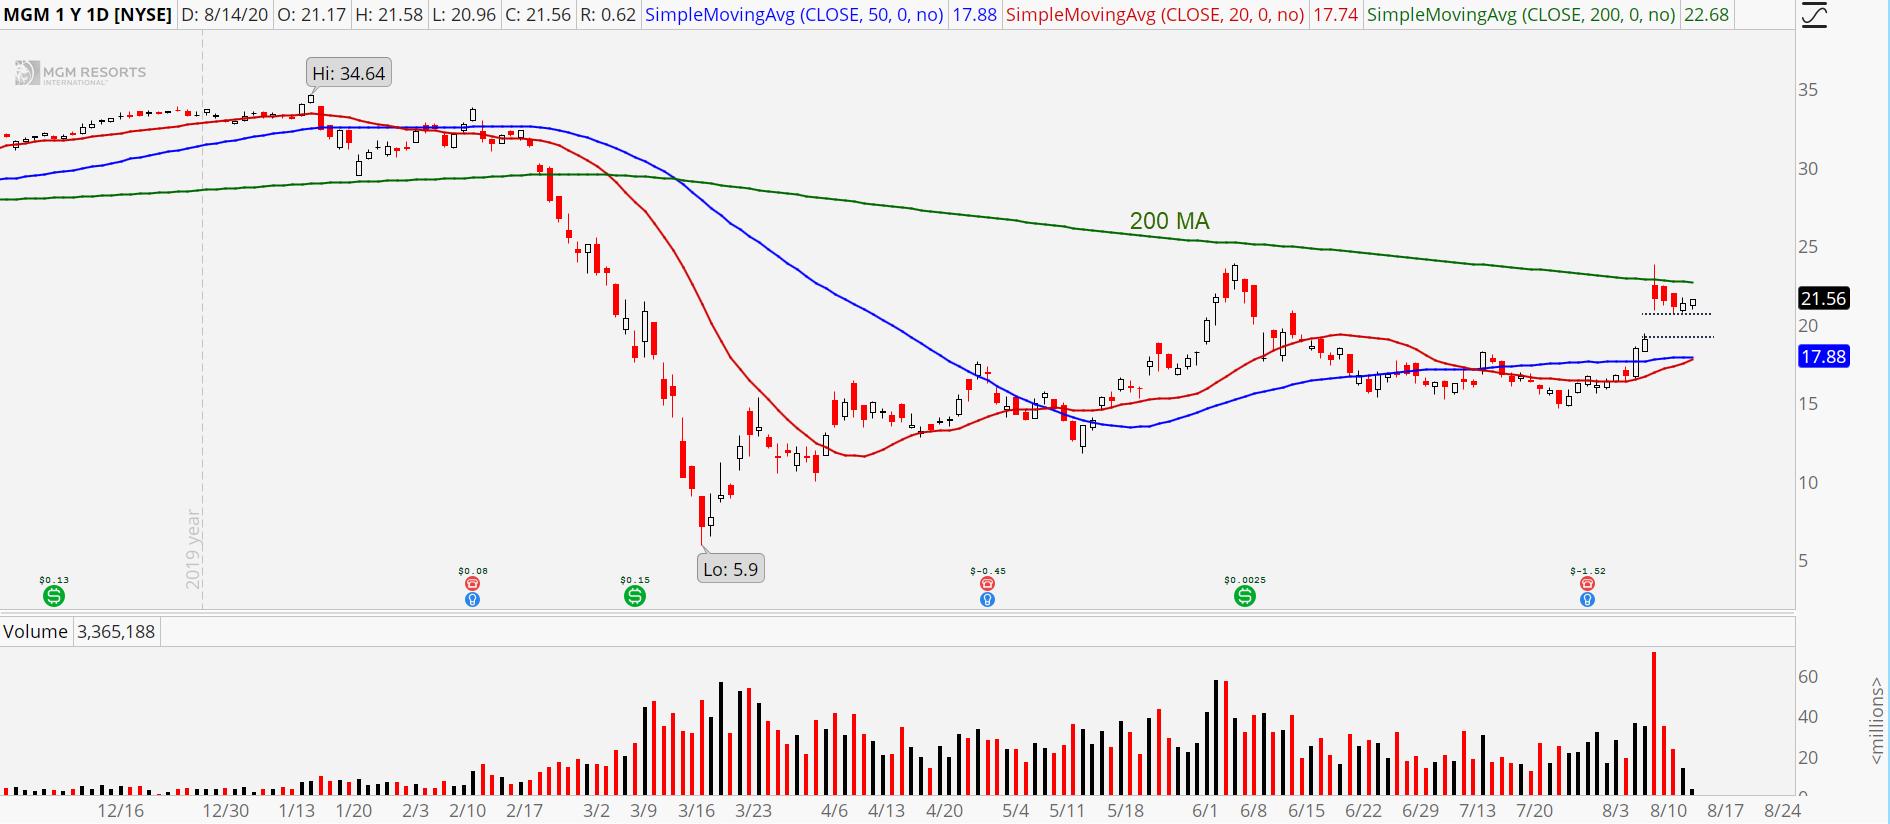 MGM Resorts (MGM) chart showing pullback buy